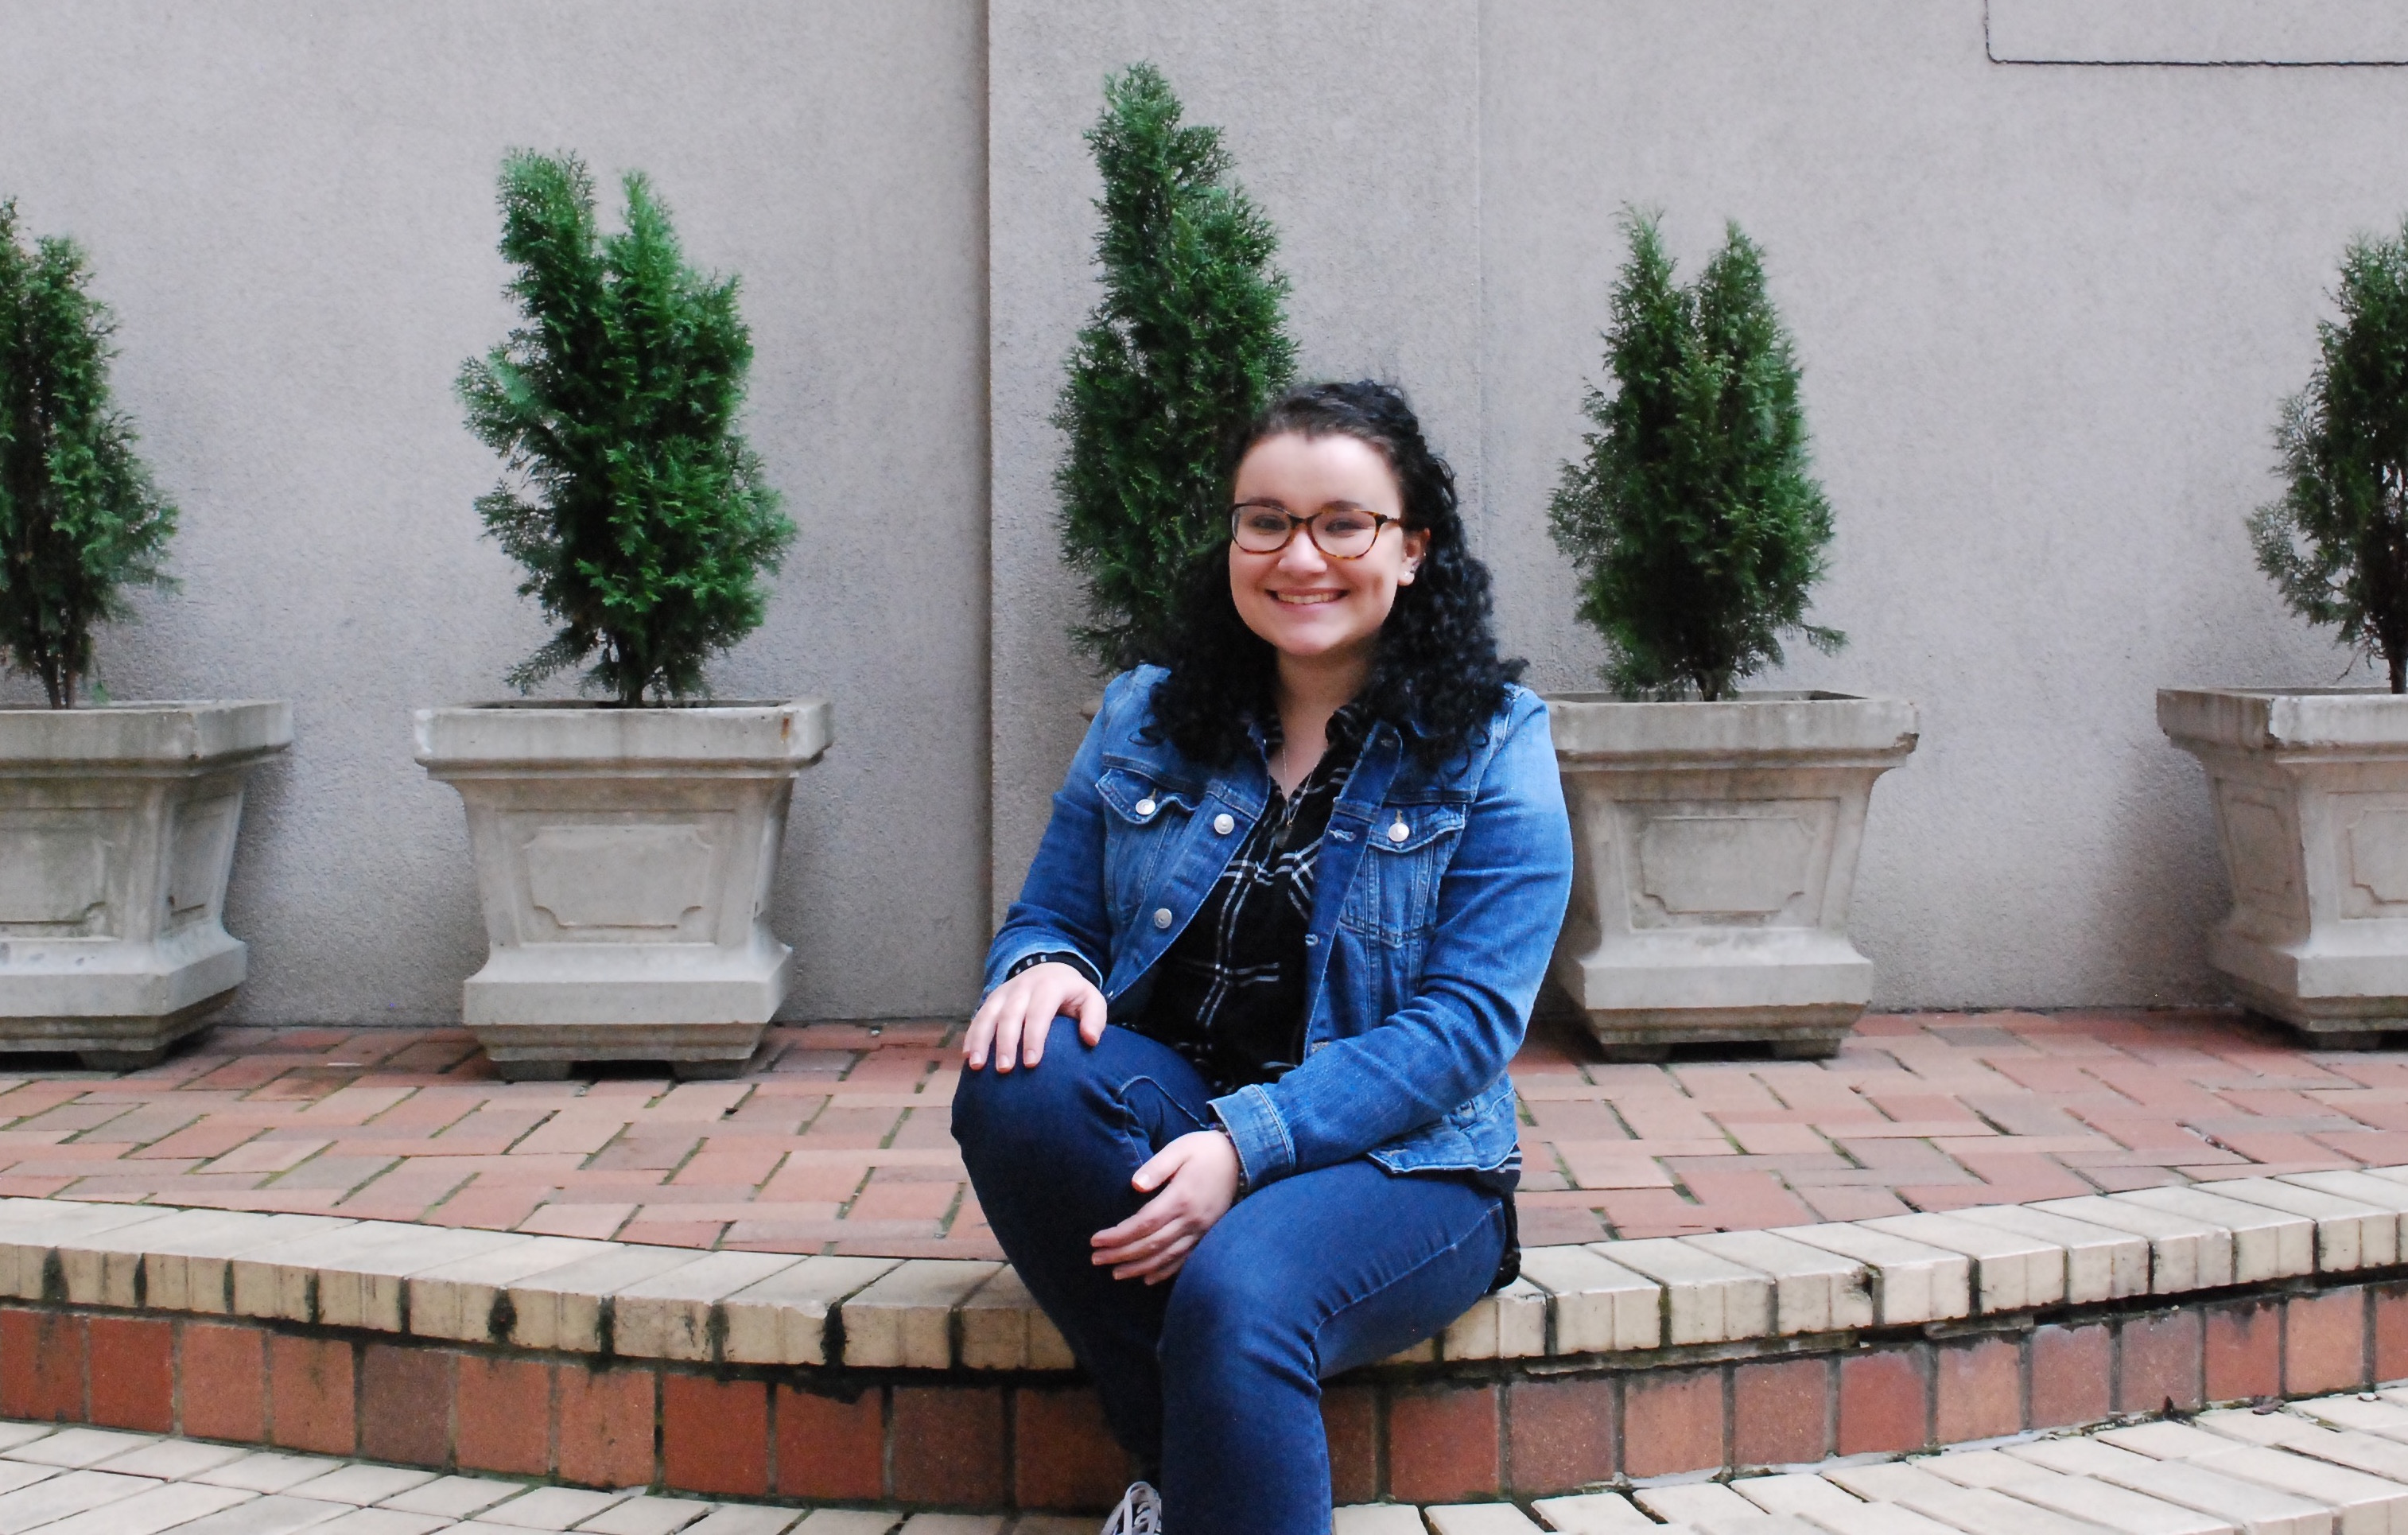 #PittsburghMe: Meet Patty Sorg, Criminal Justice Major Student Profile